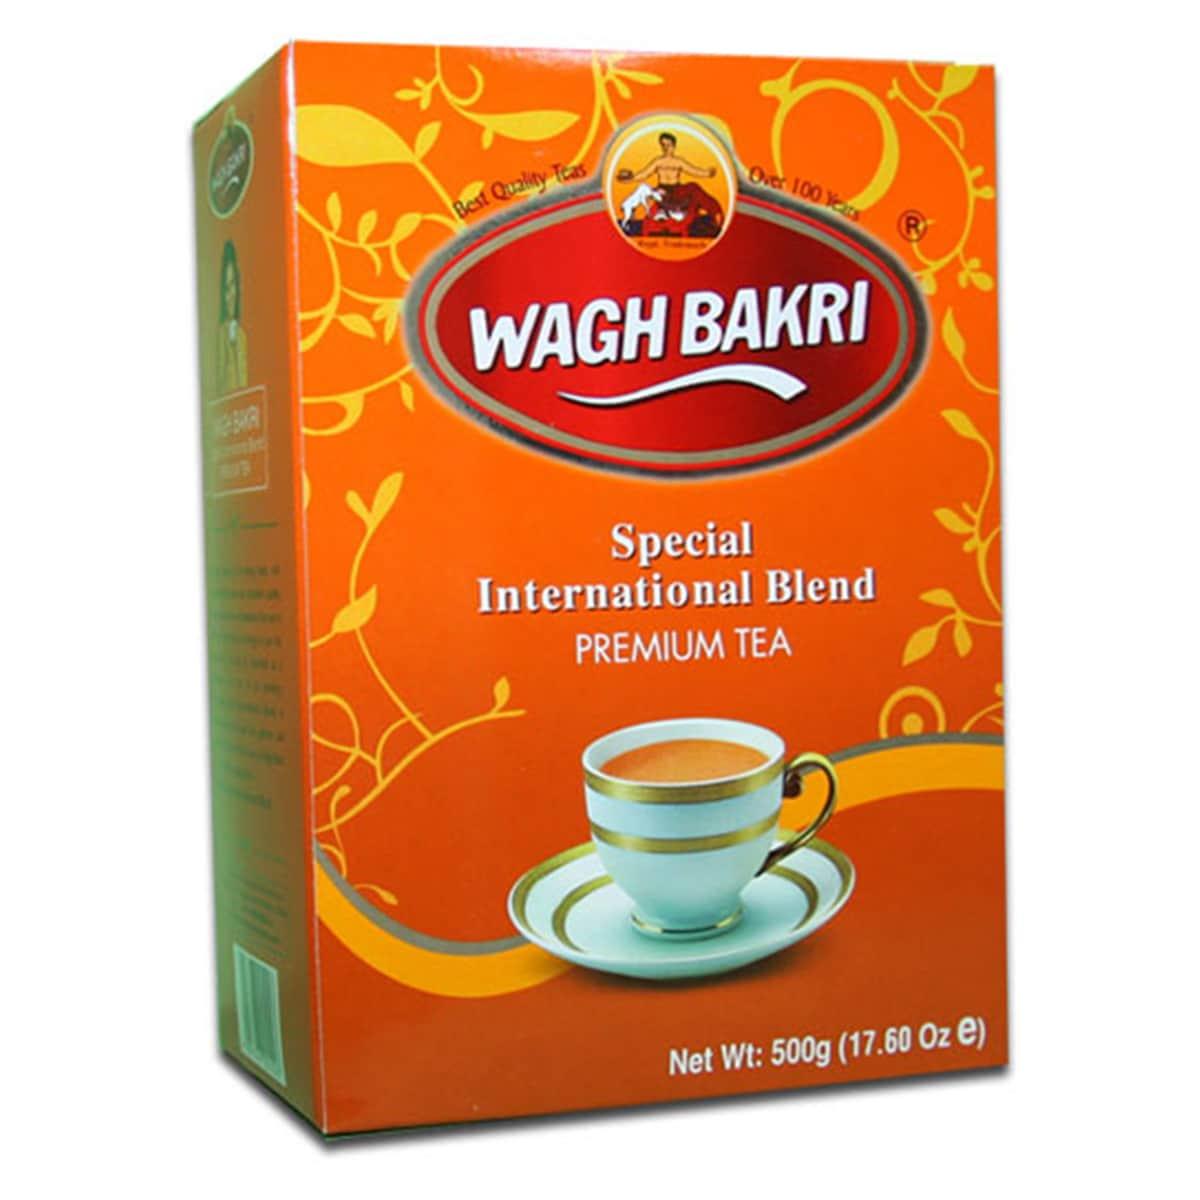 Buy Wagh Bakri Special International Blend Premium Tea Leaf (Loose Tea) - 500 gm